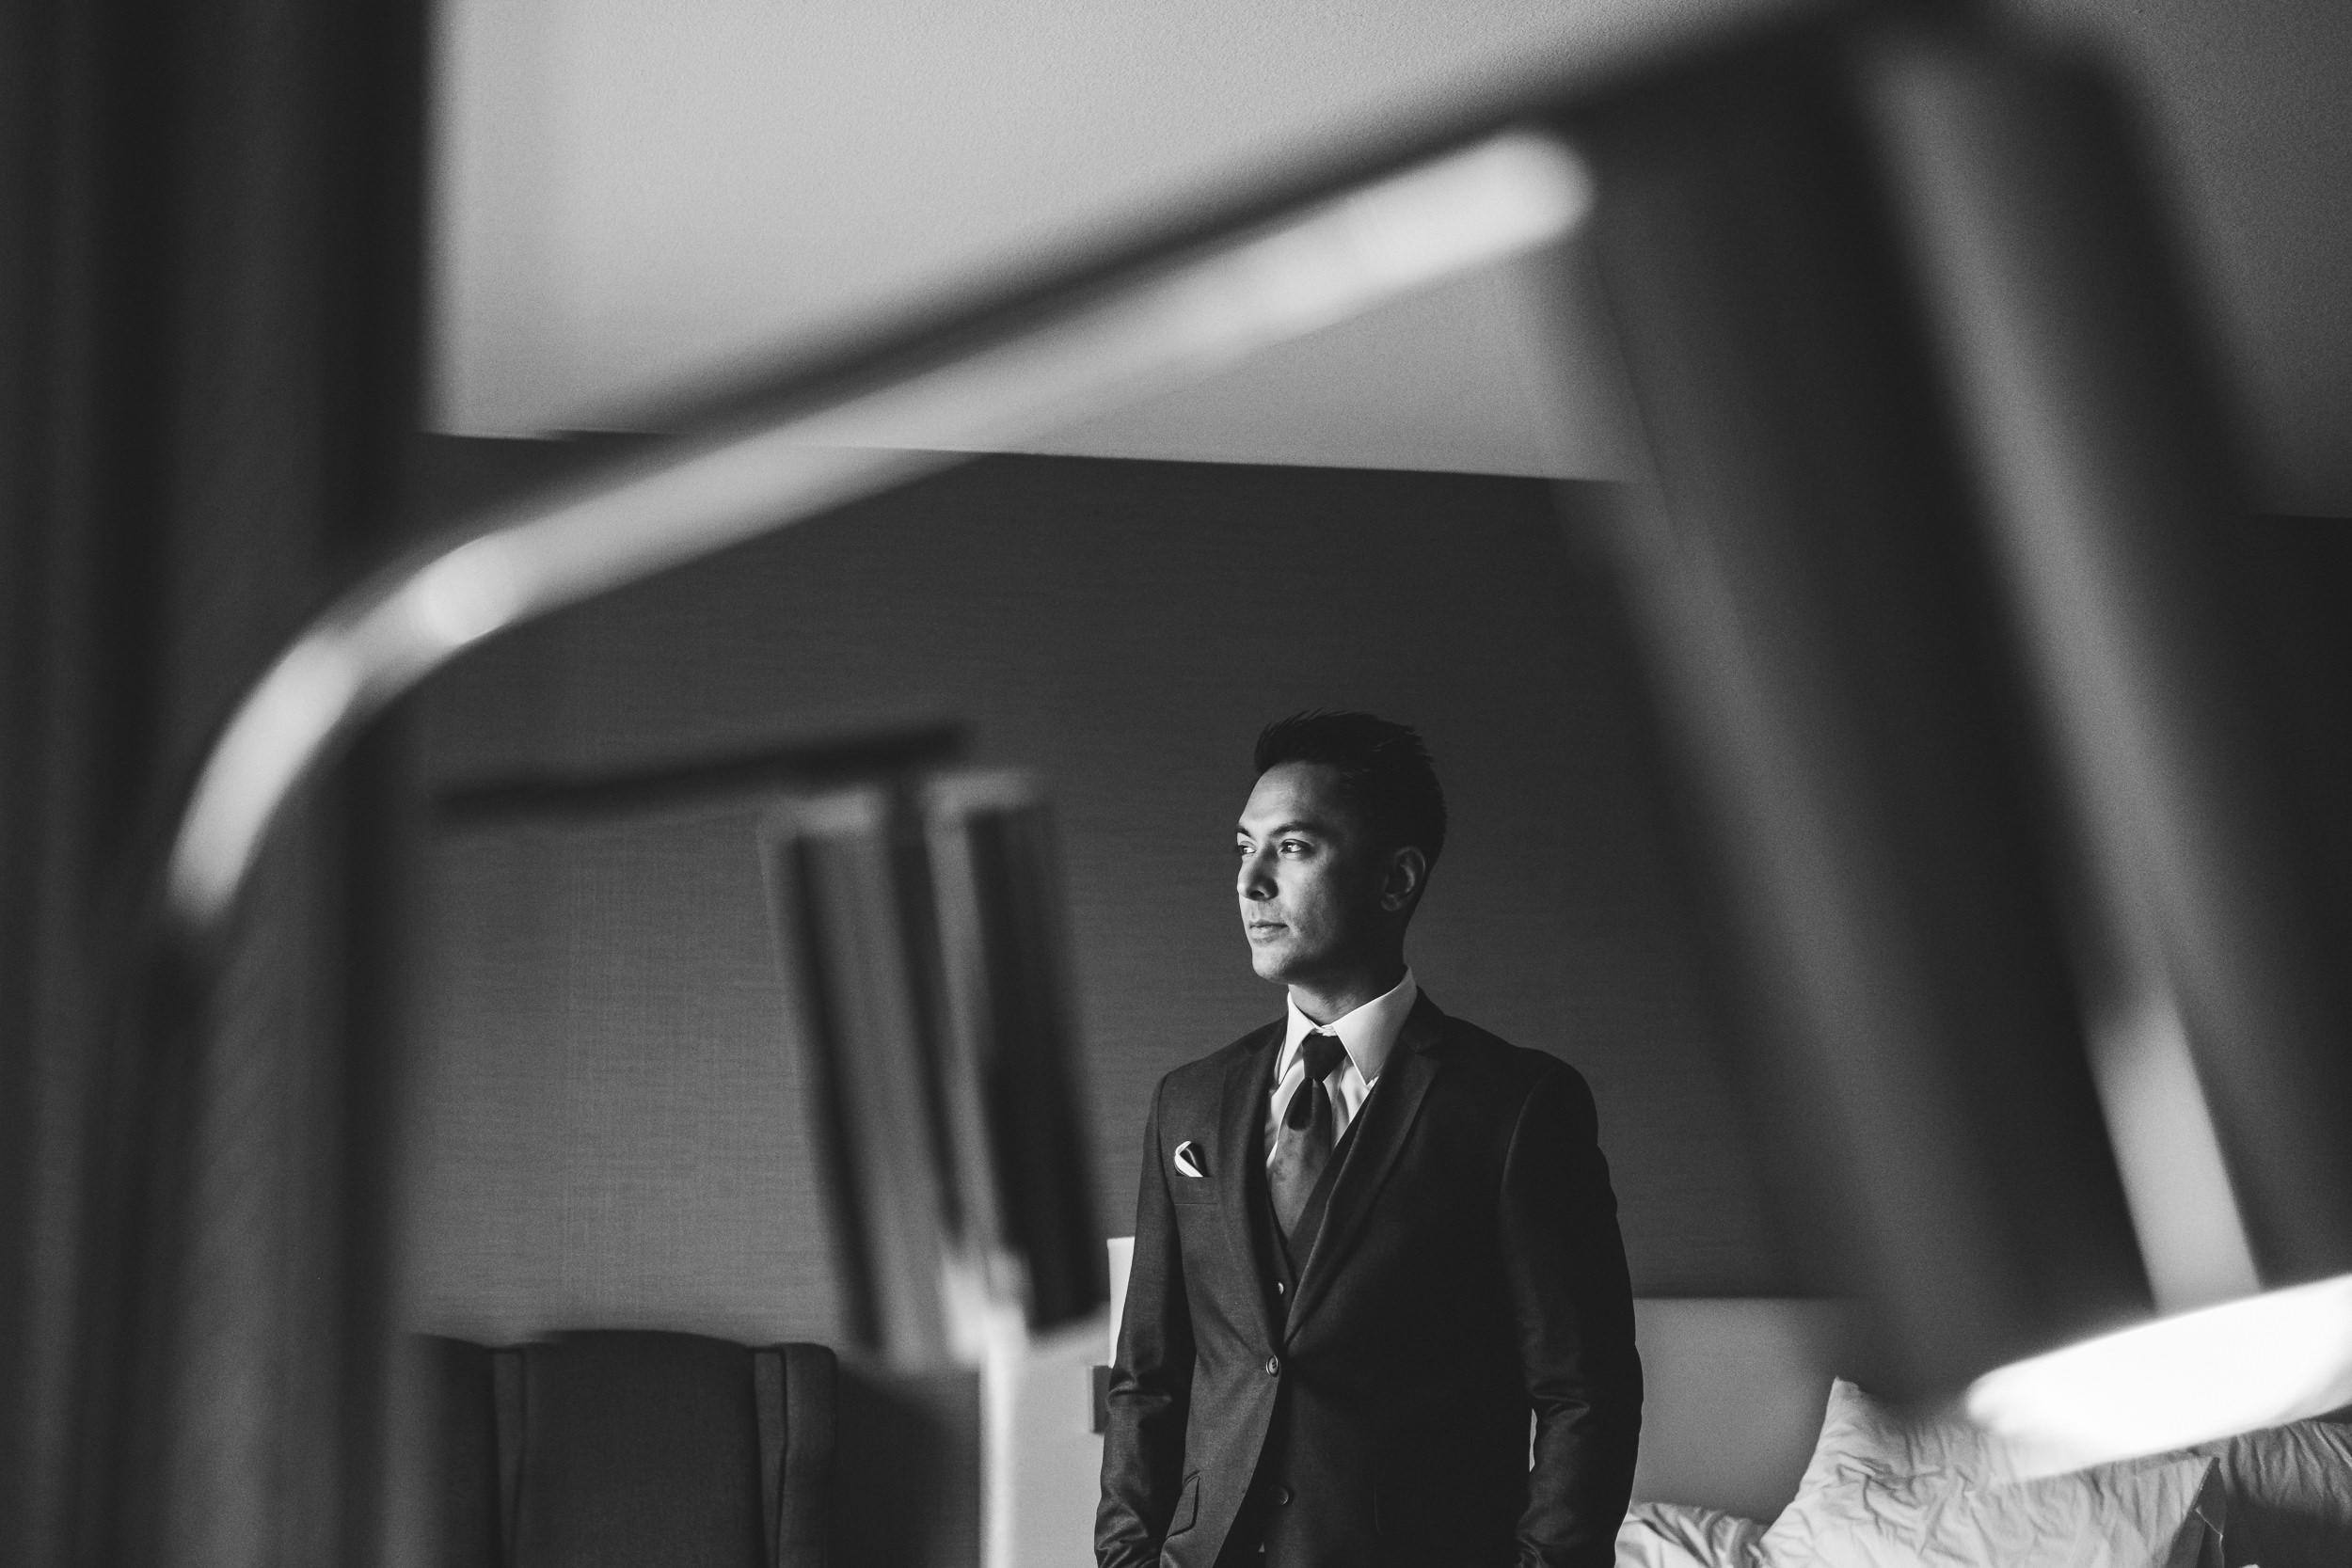 San-Francisco-City-Hall-Wedding-Photography-029.jpg